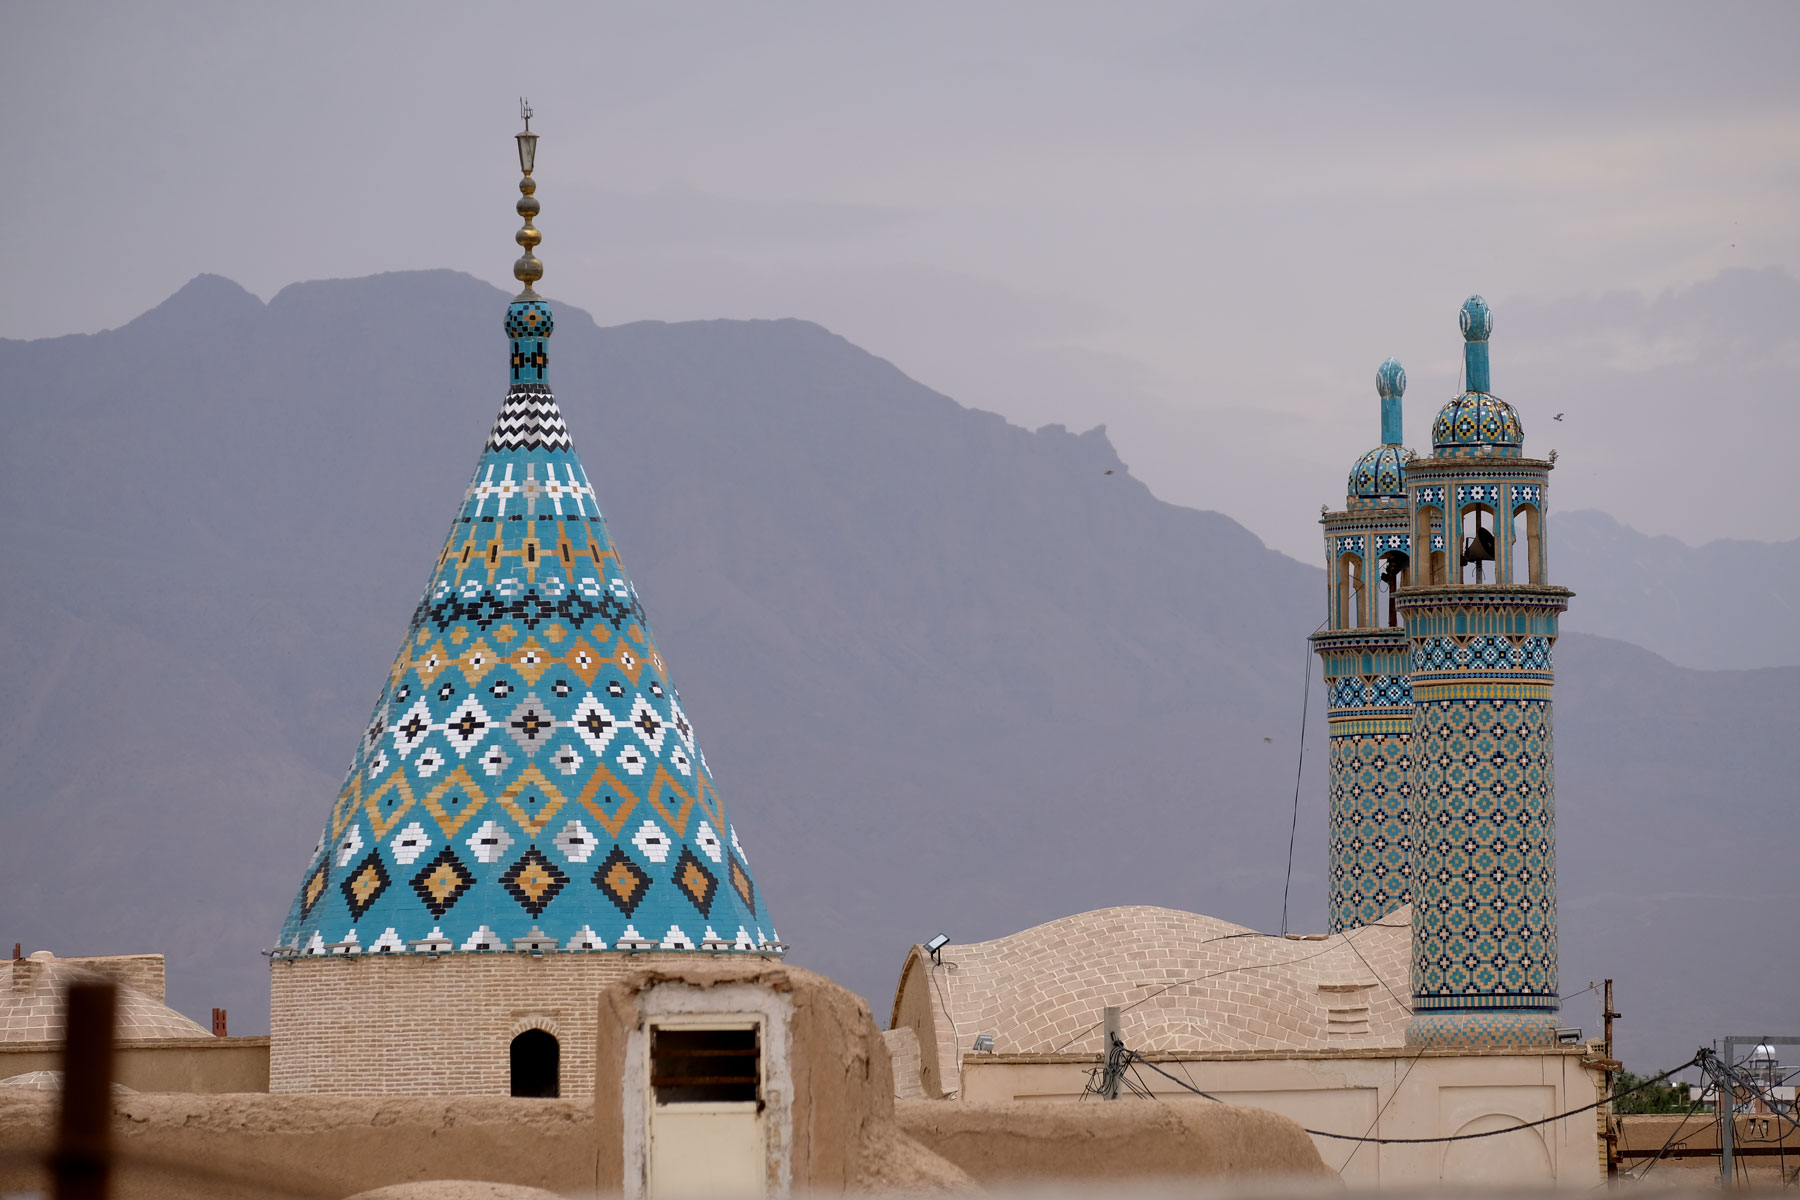 Dach des Shahzada Ibrahim Mausoleums